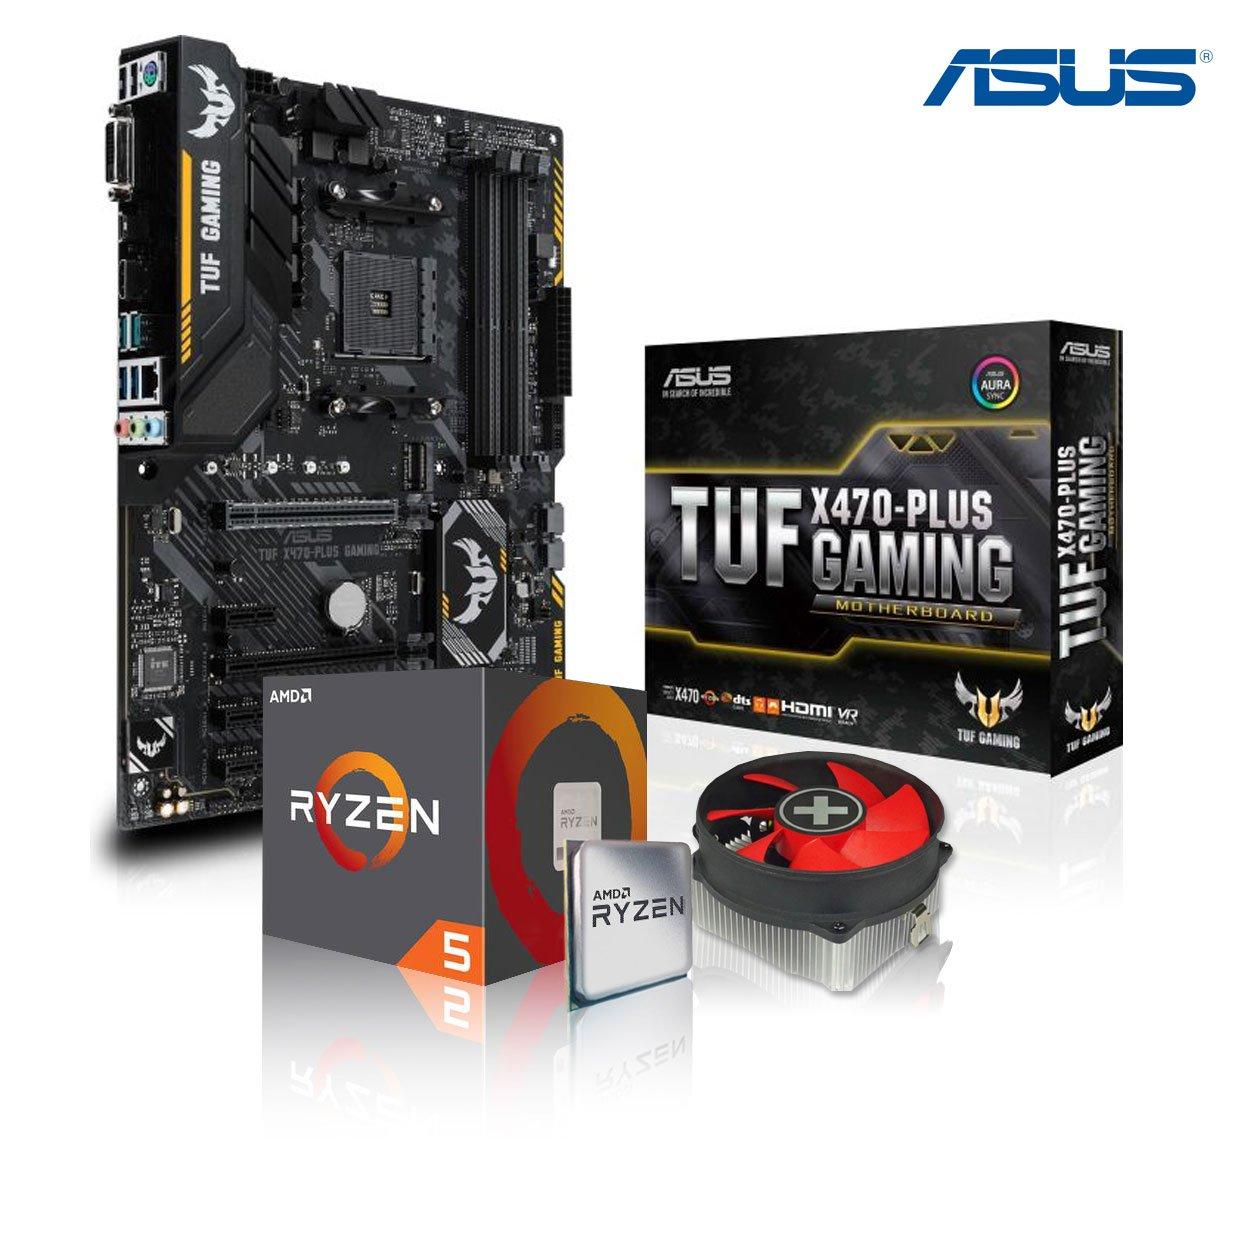 Memory PC Aufrüst-Kit Bundle AMD Ryzen 5 2600 6X 3.4 GHz, 16 GB DDR4, ASUS Prime B350M-A, komplett fertig montiert